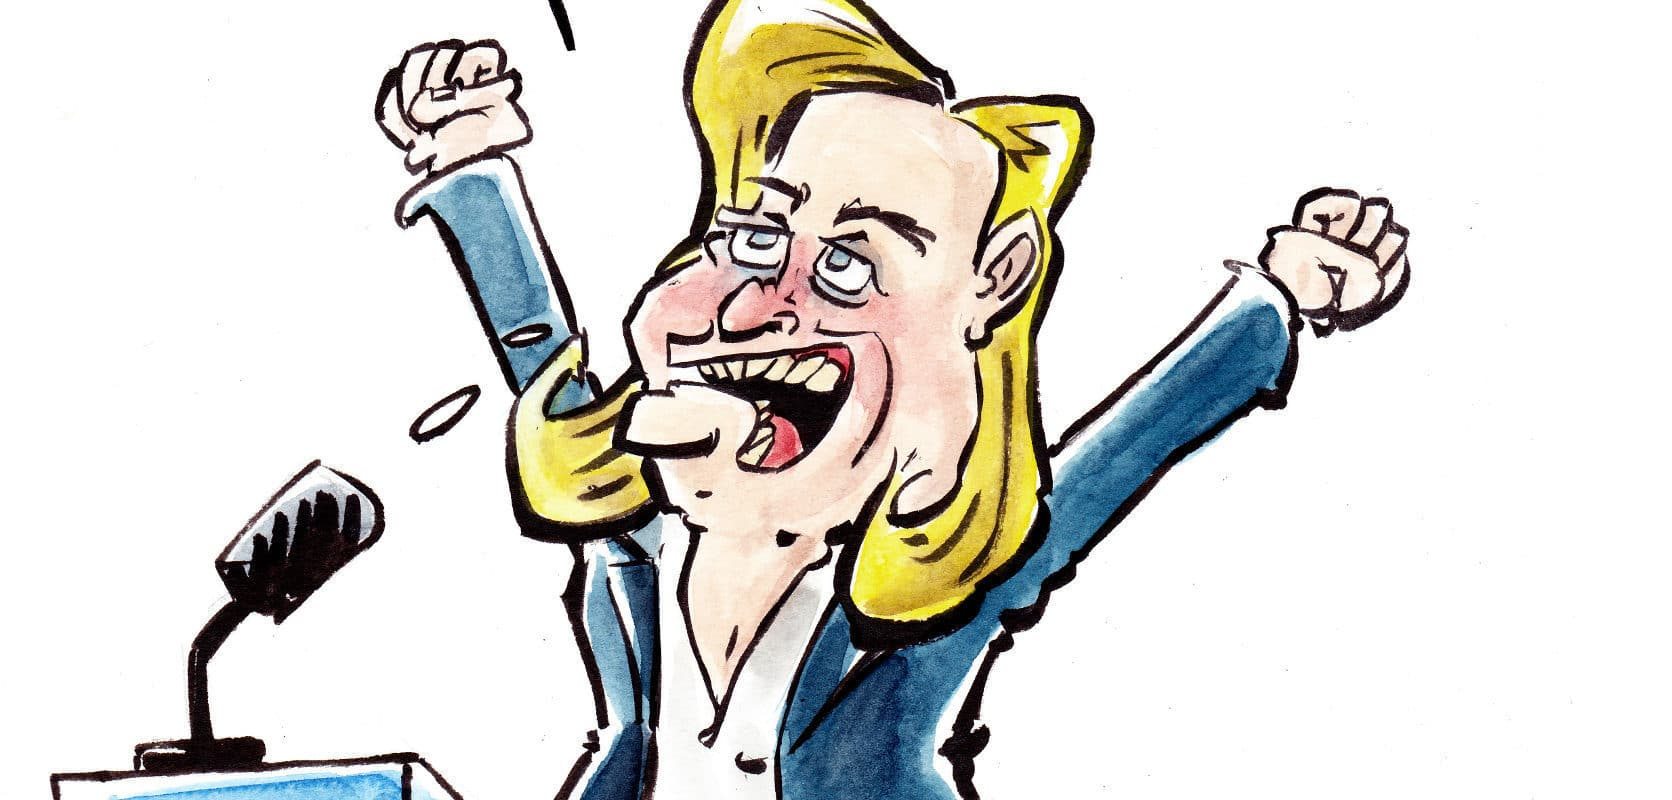 L'obsession identitaire de Marine Le Pen